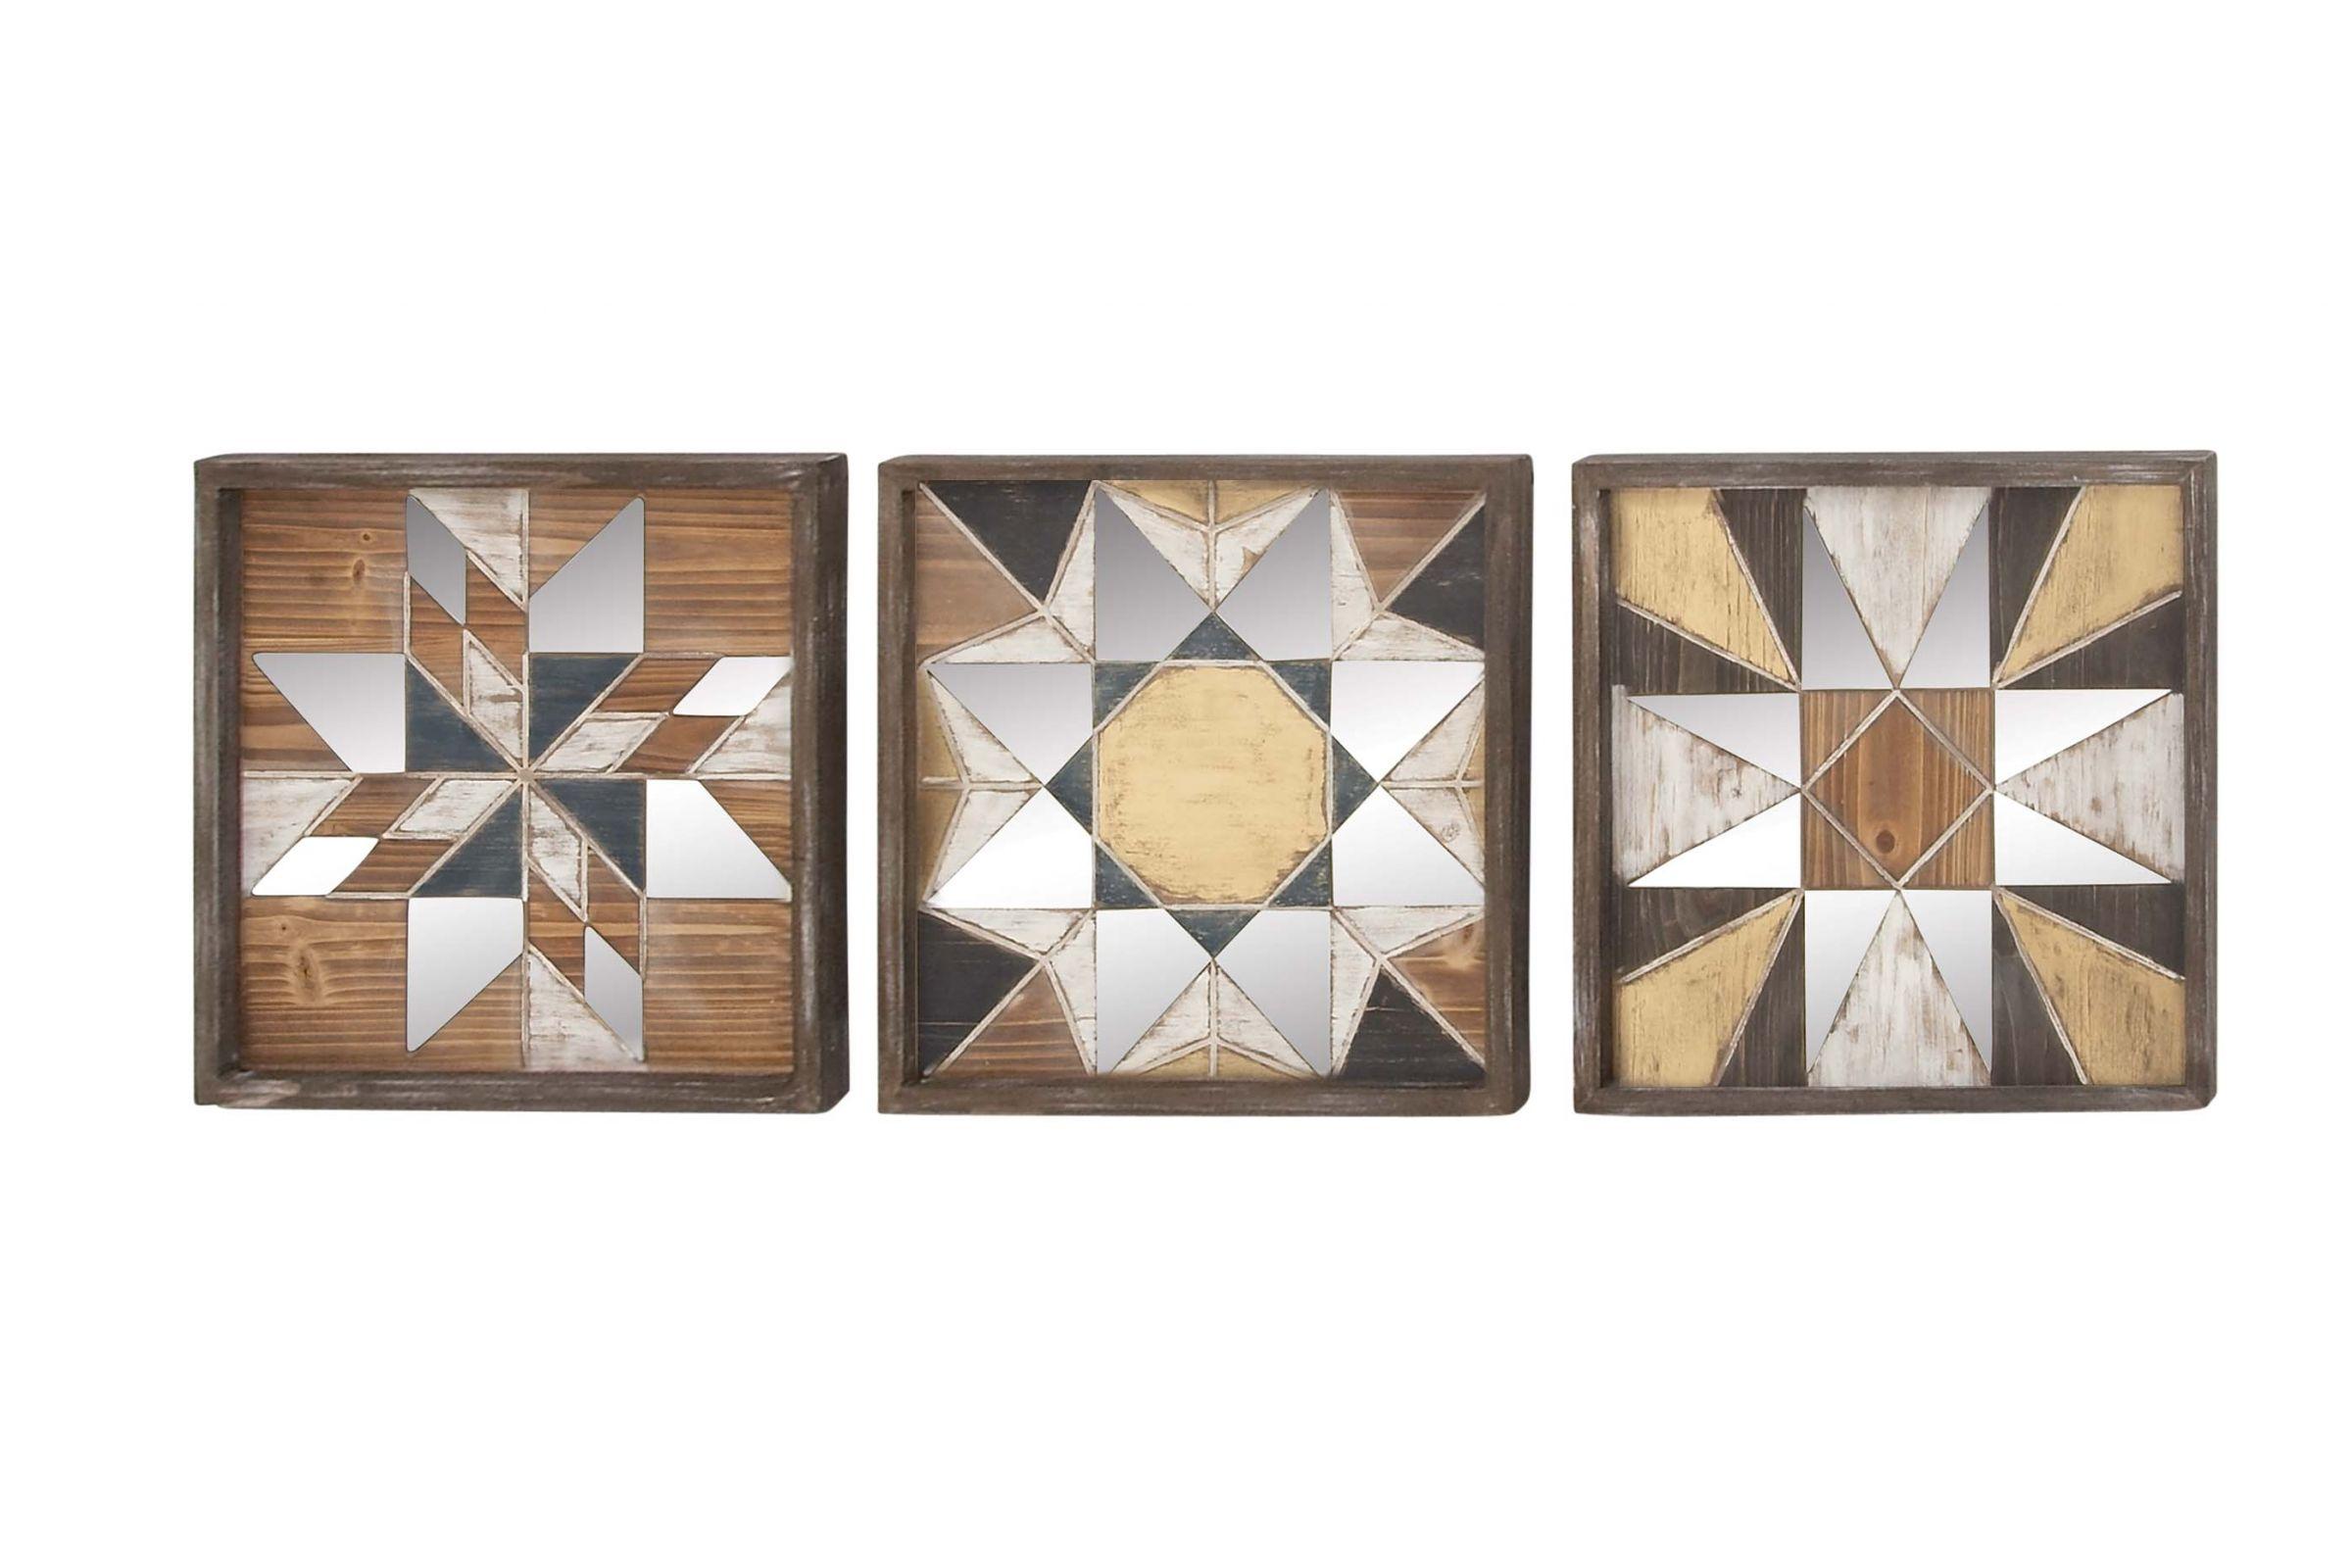 Rustic Reflections Geometric Wall Decor